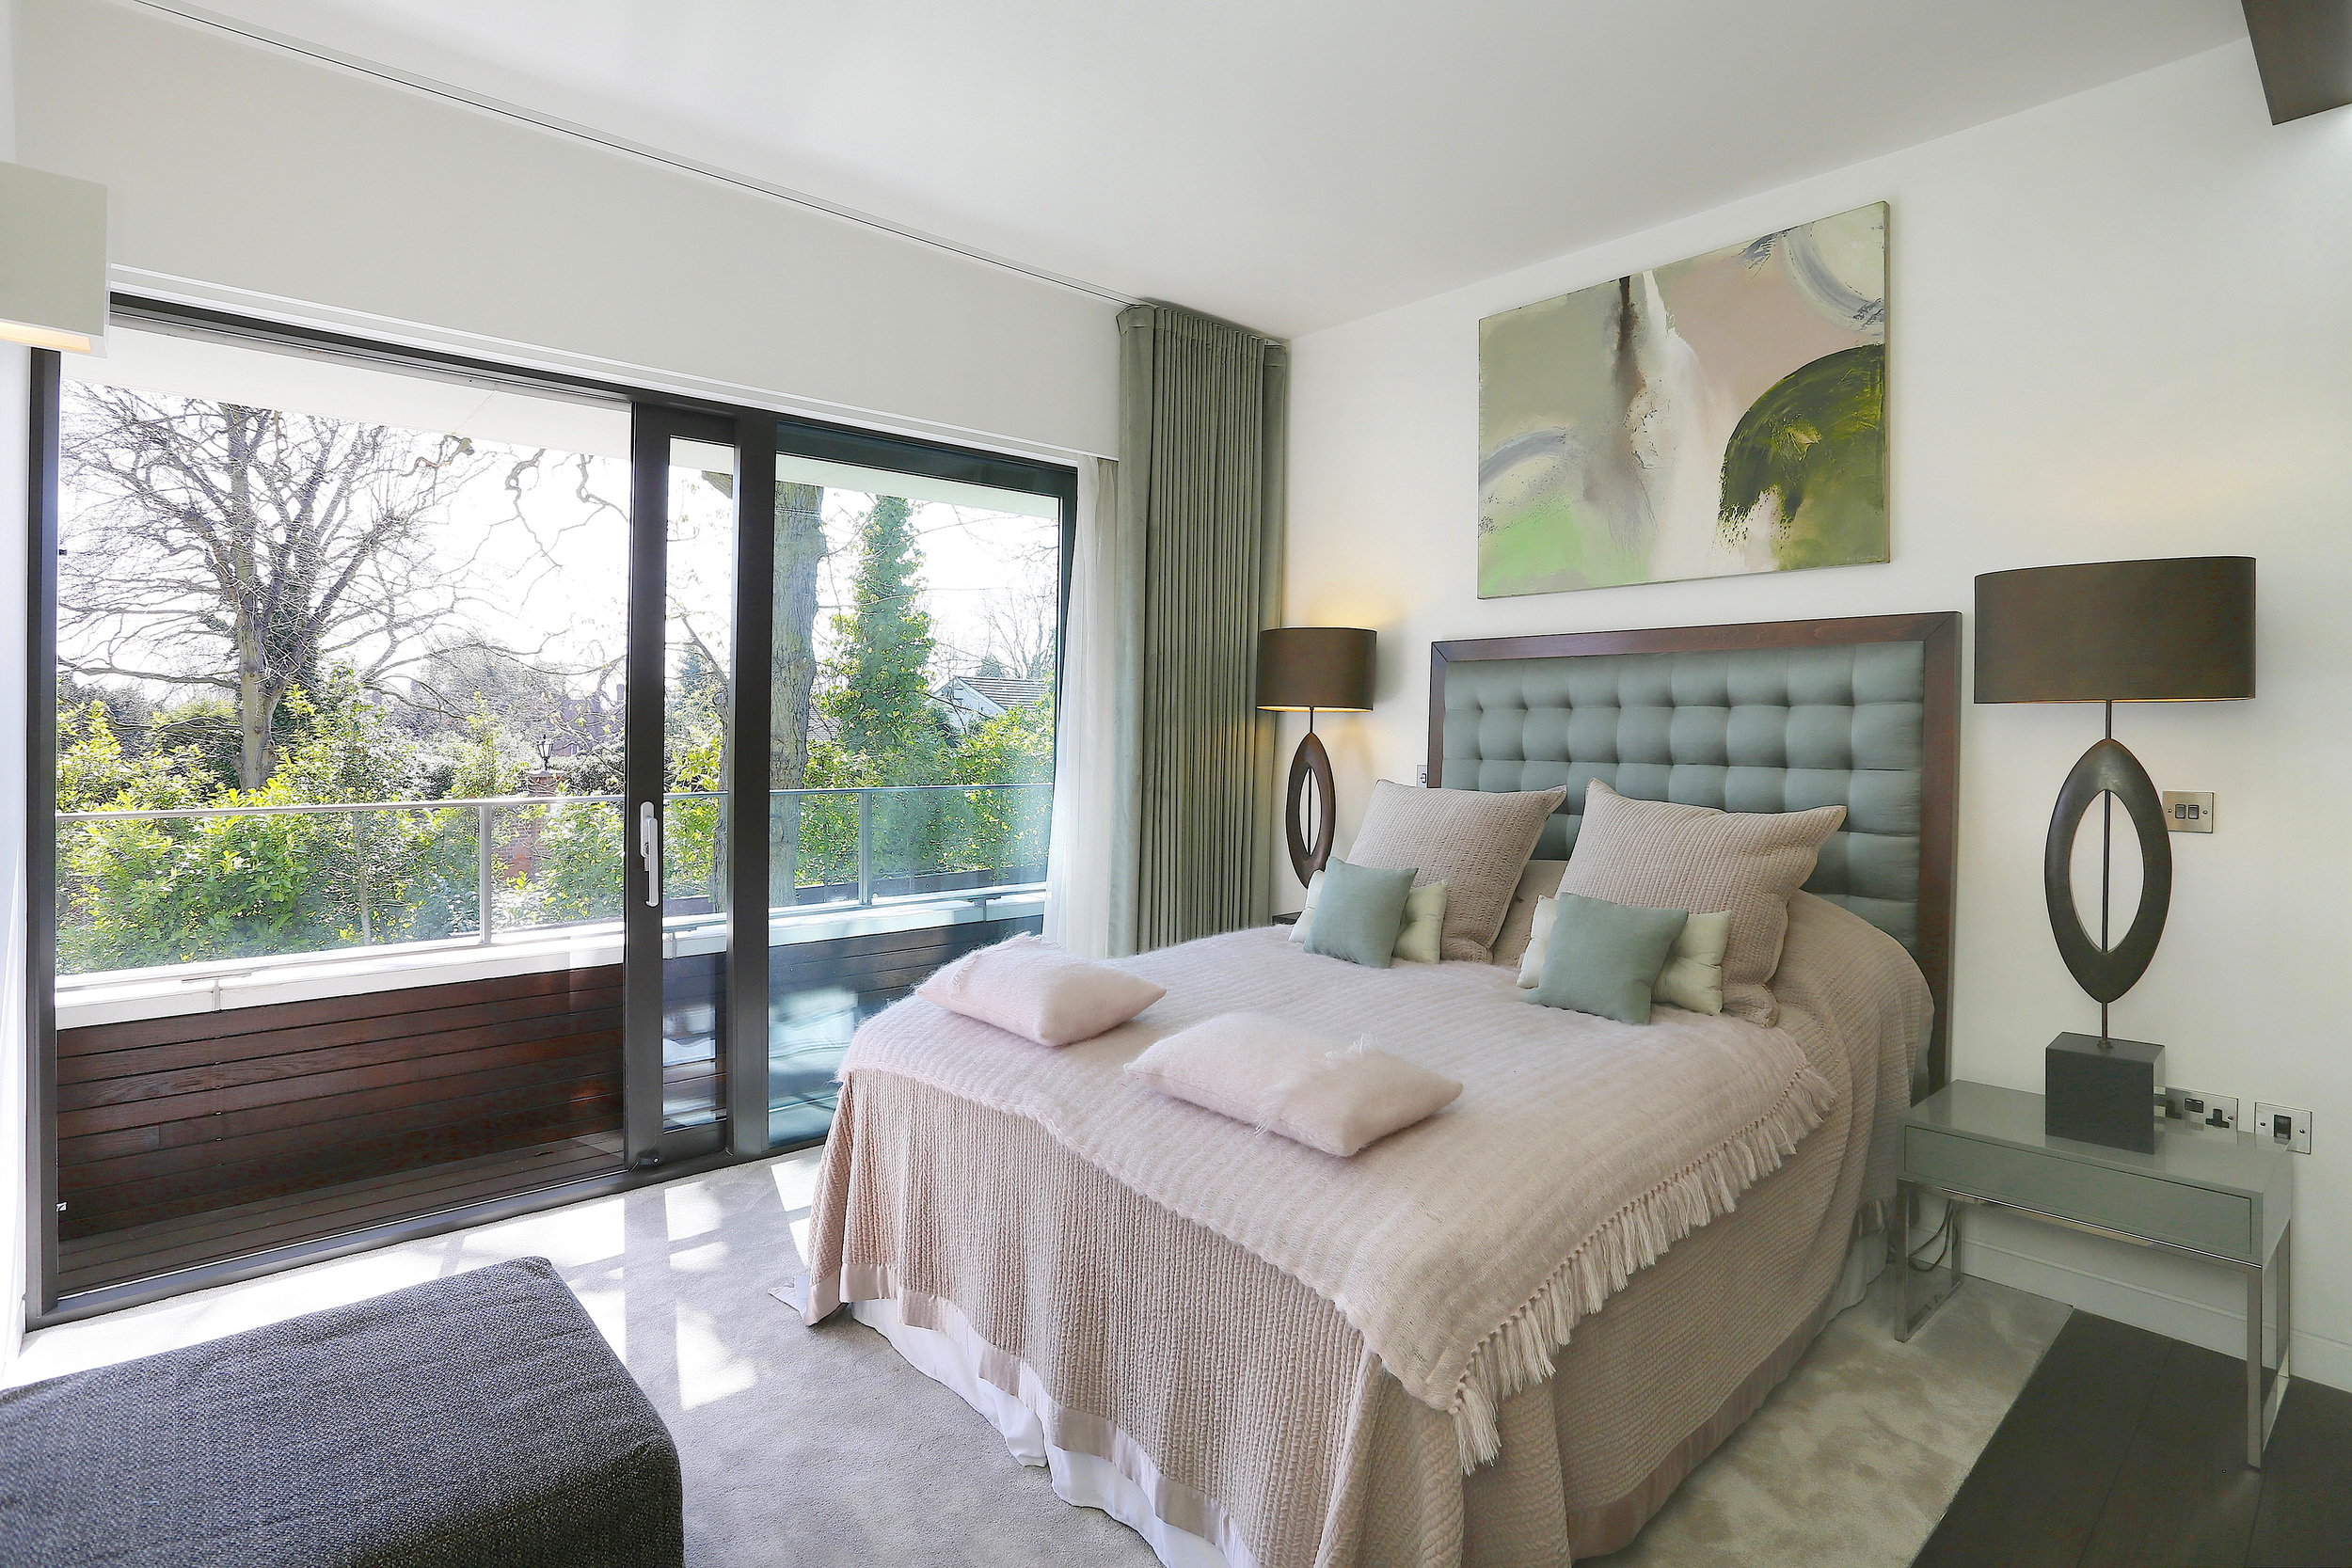 Amoula Hse - Bed1.jpg